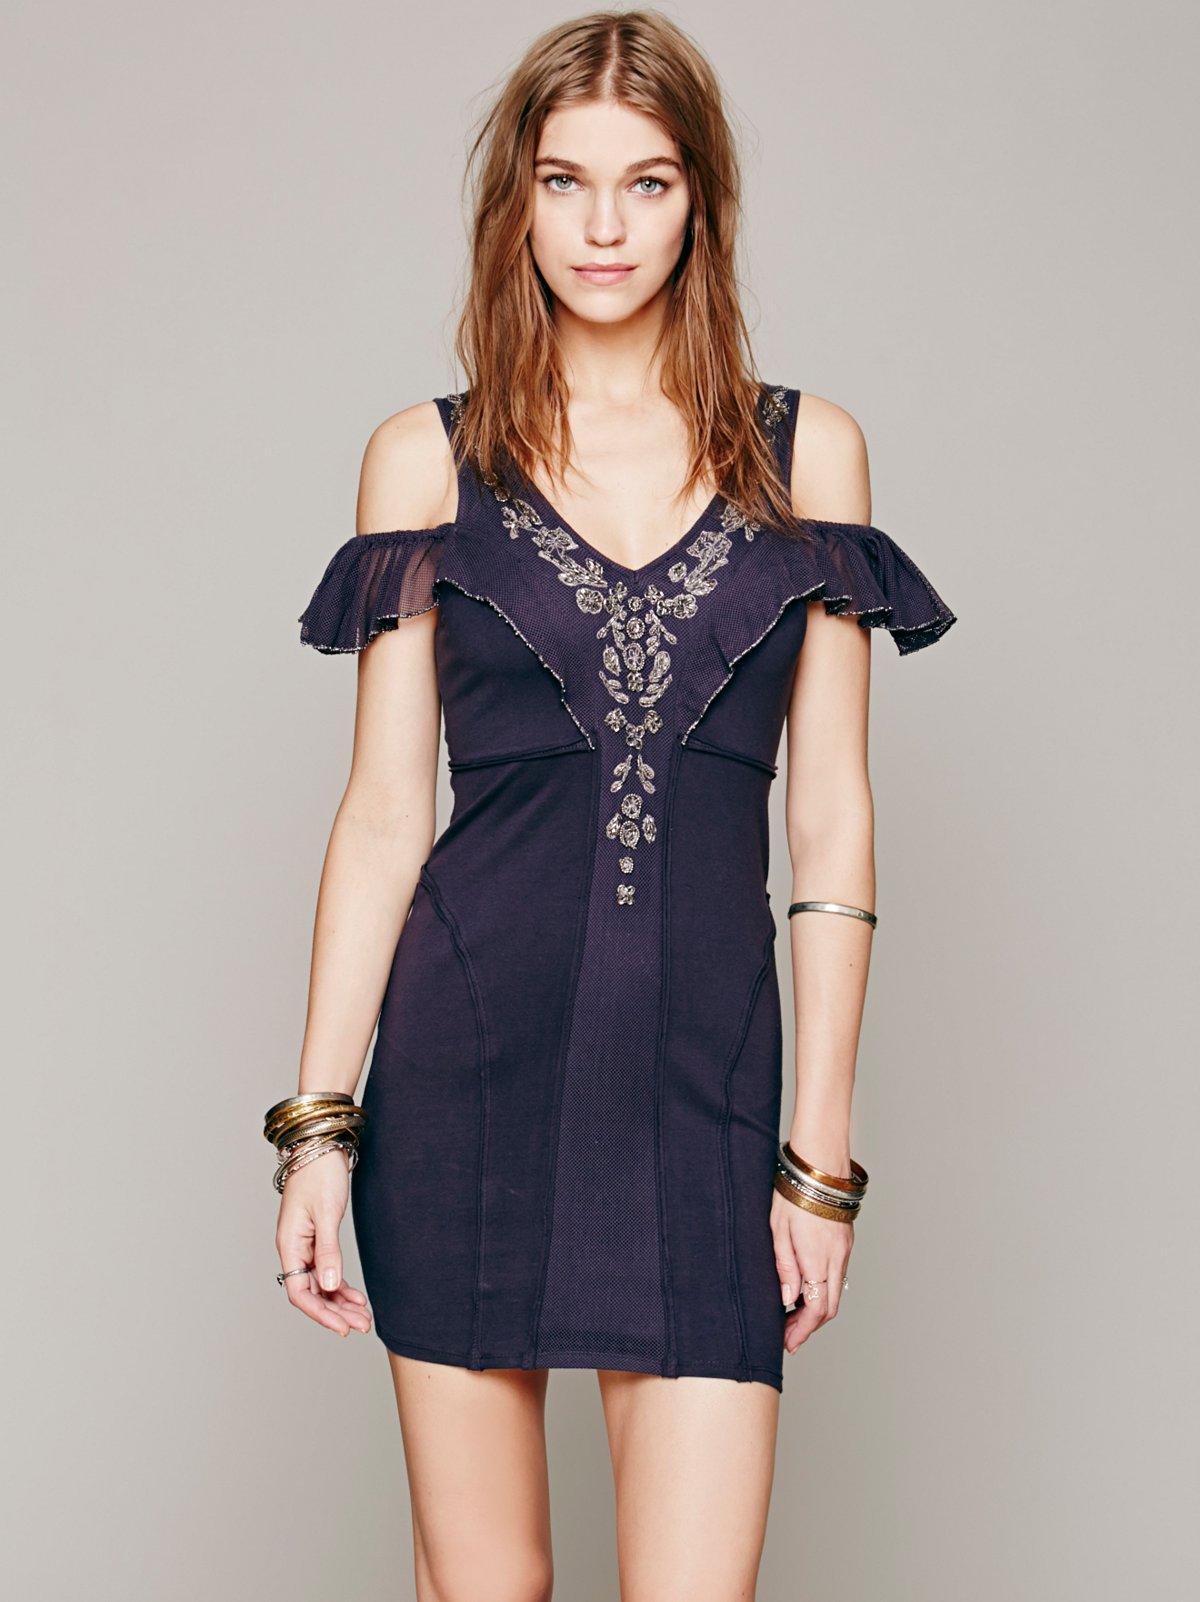 Candelabra Mini Dress